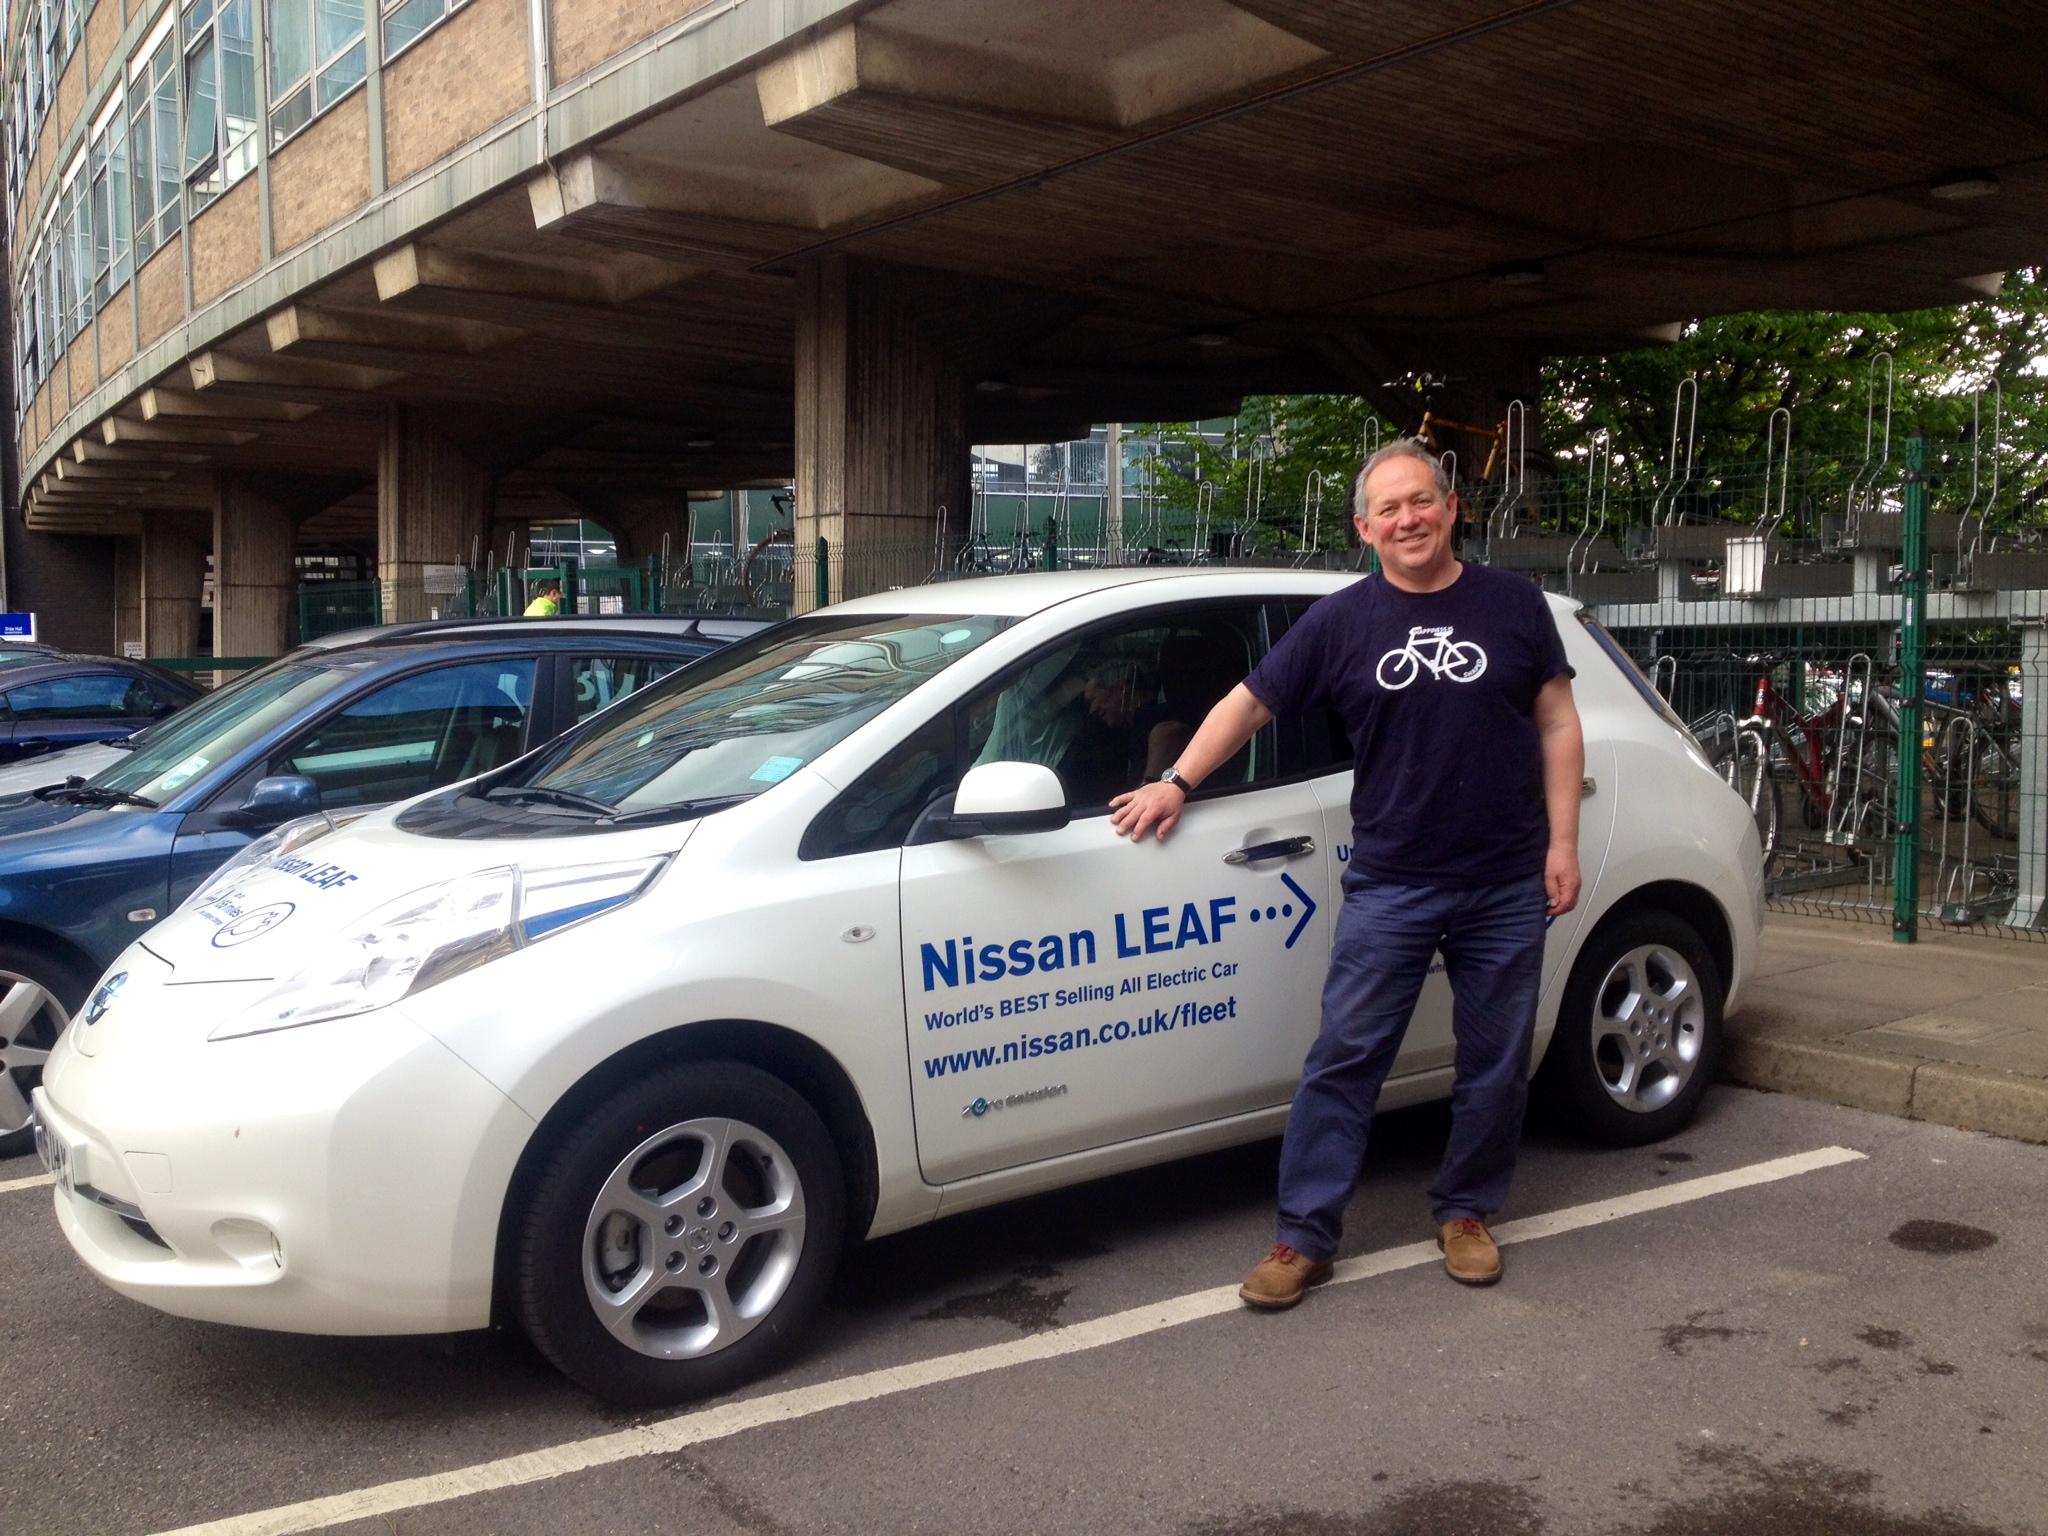 key_Cllr._Iain_Dobie_-_Nissan_Leaf.jpg